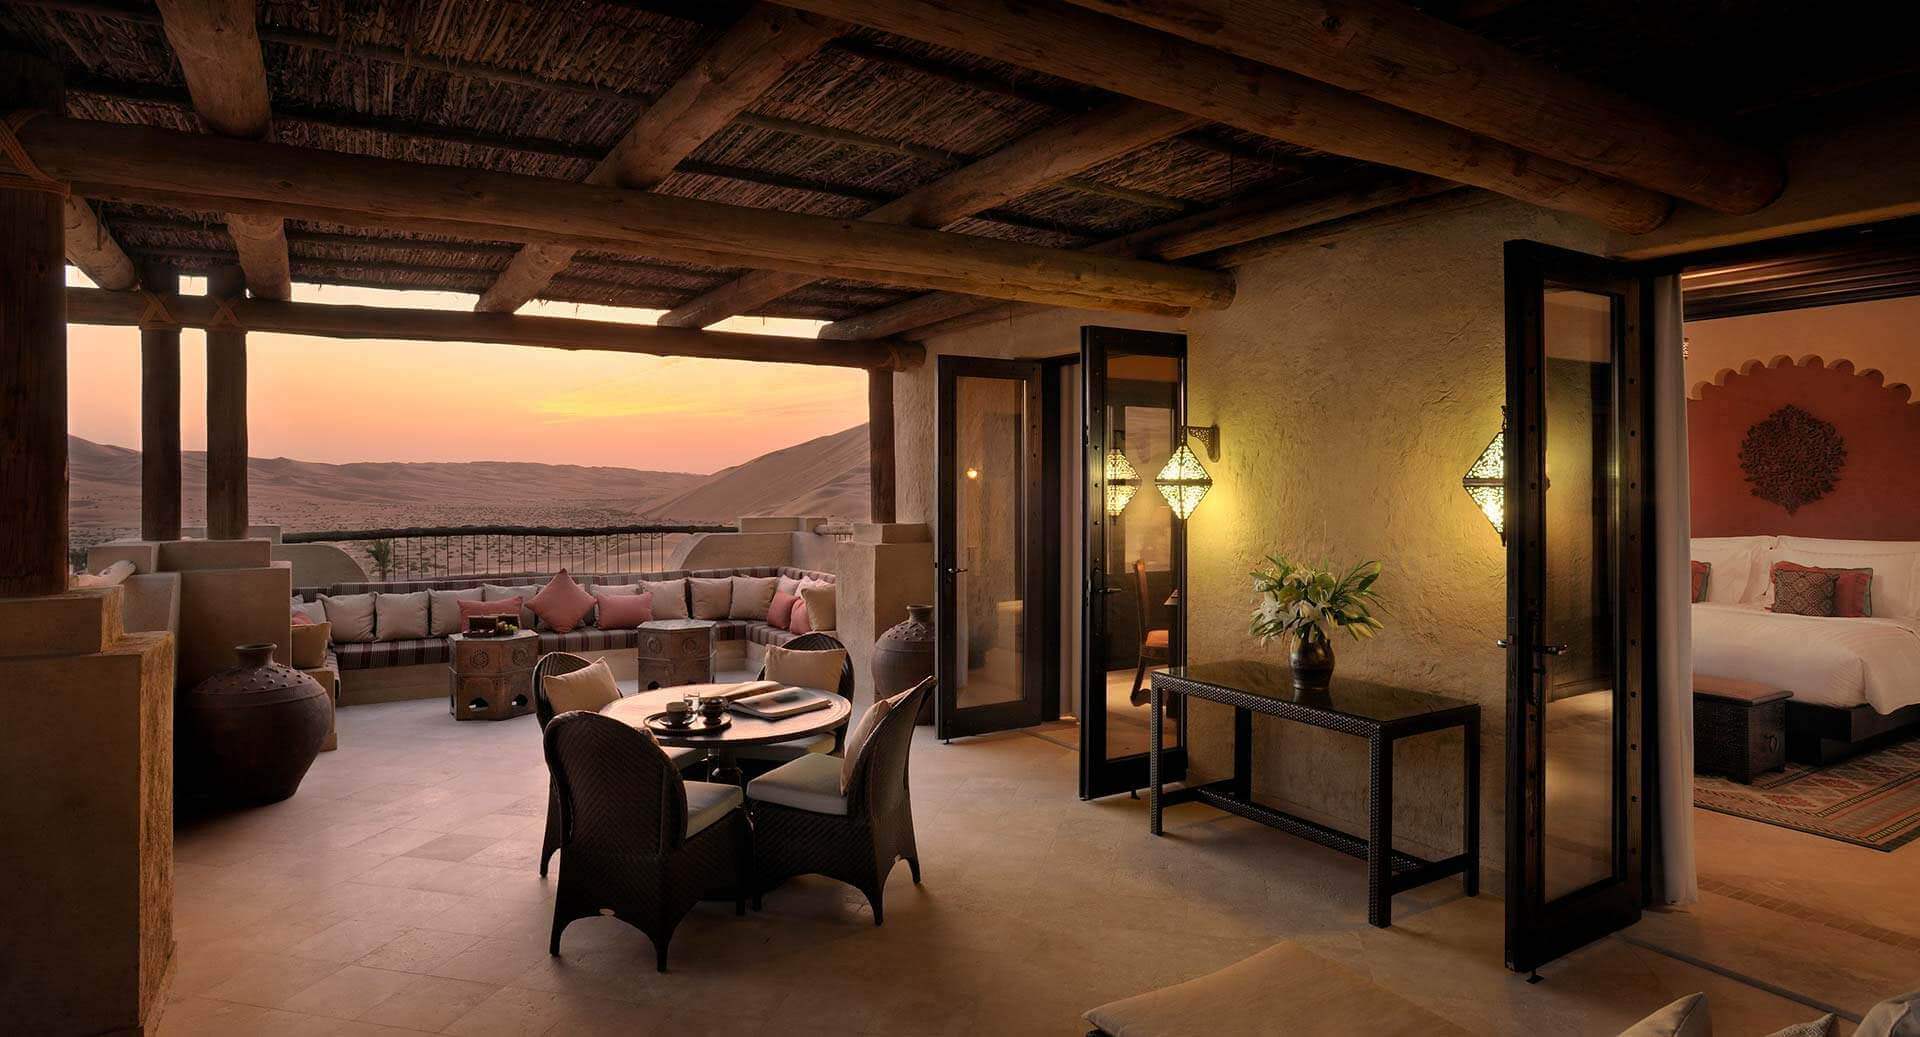 منتجع قصر السراب - غرفة - Luxuria Tours